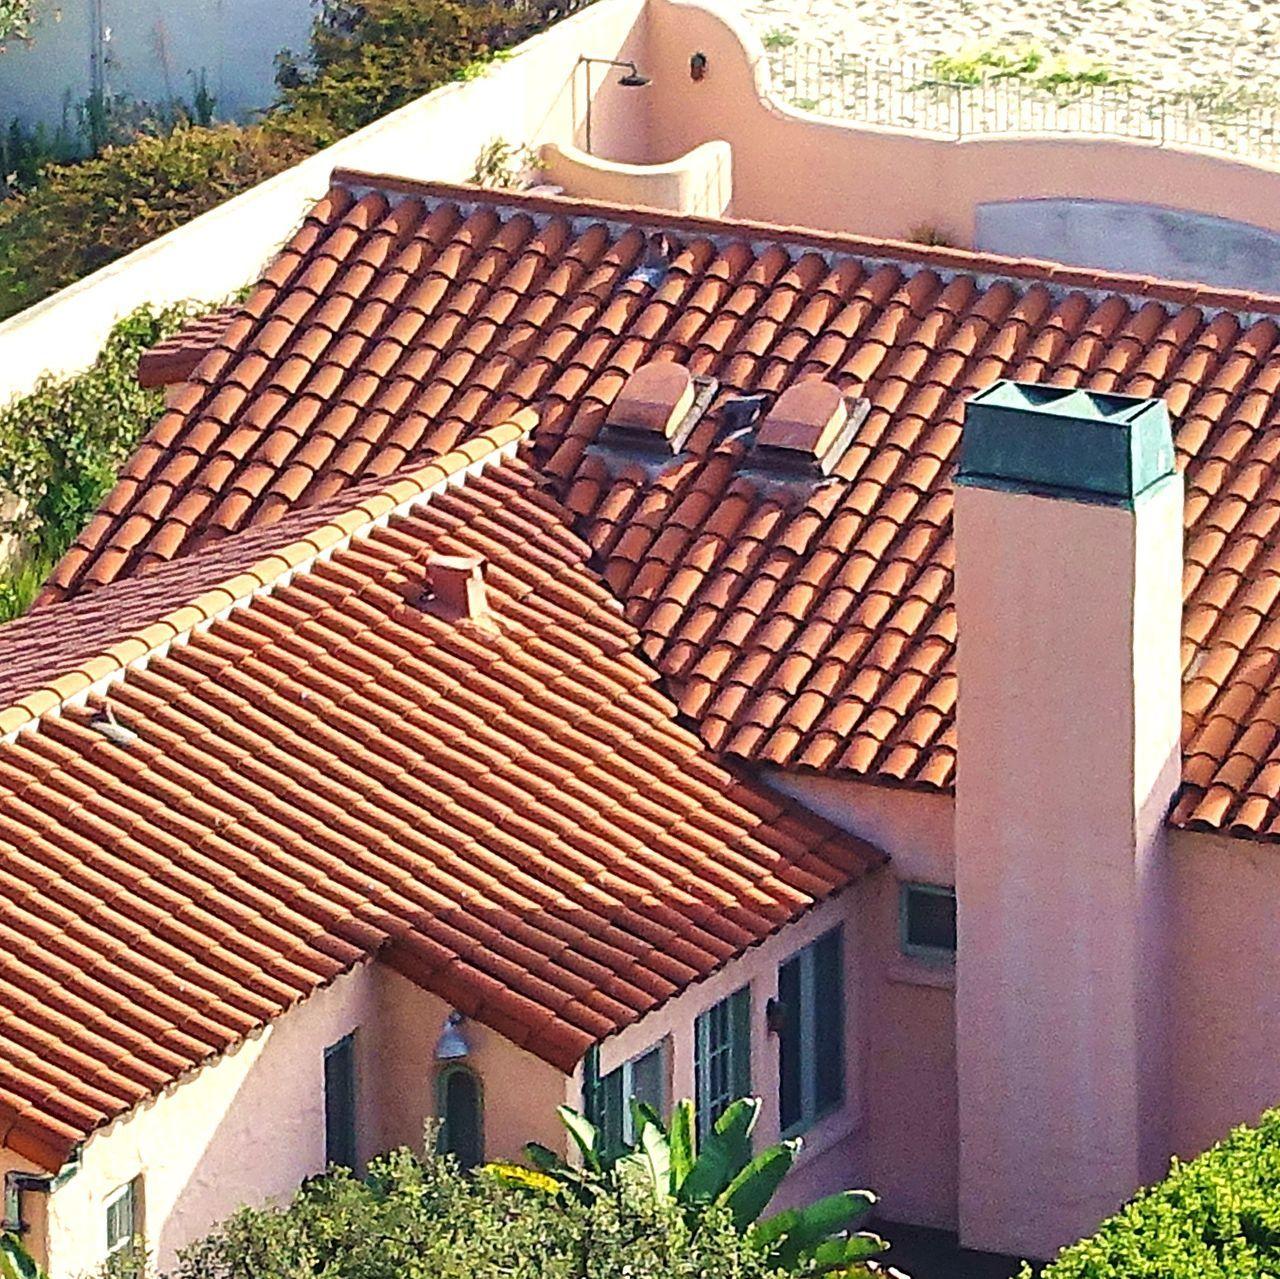 Rooftop Roof TilesArchitecture Building Exteriors sunlight No People EyeEm Best Shots The Week On Eyem EyeEm Gallery